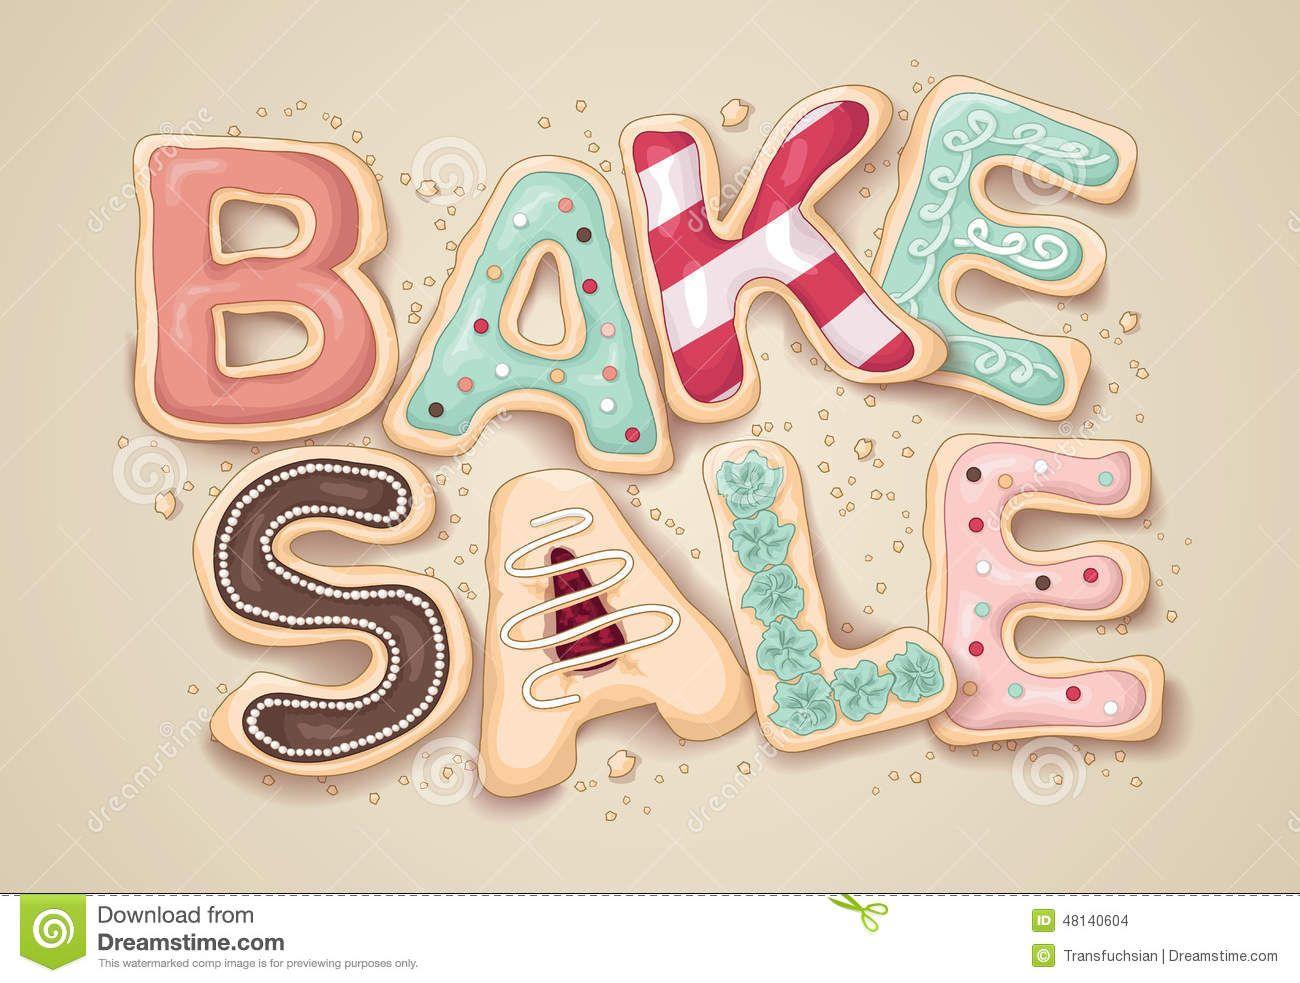 Packaging For Bake Sales  Google Search  De Galletas